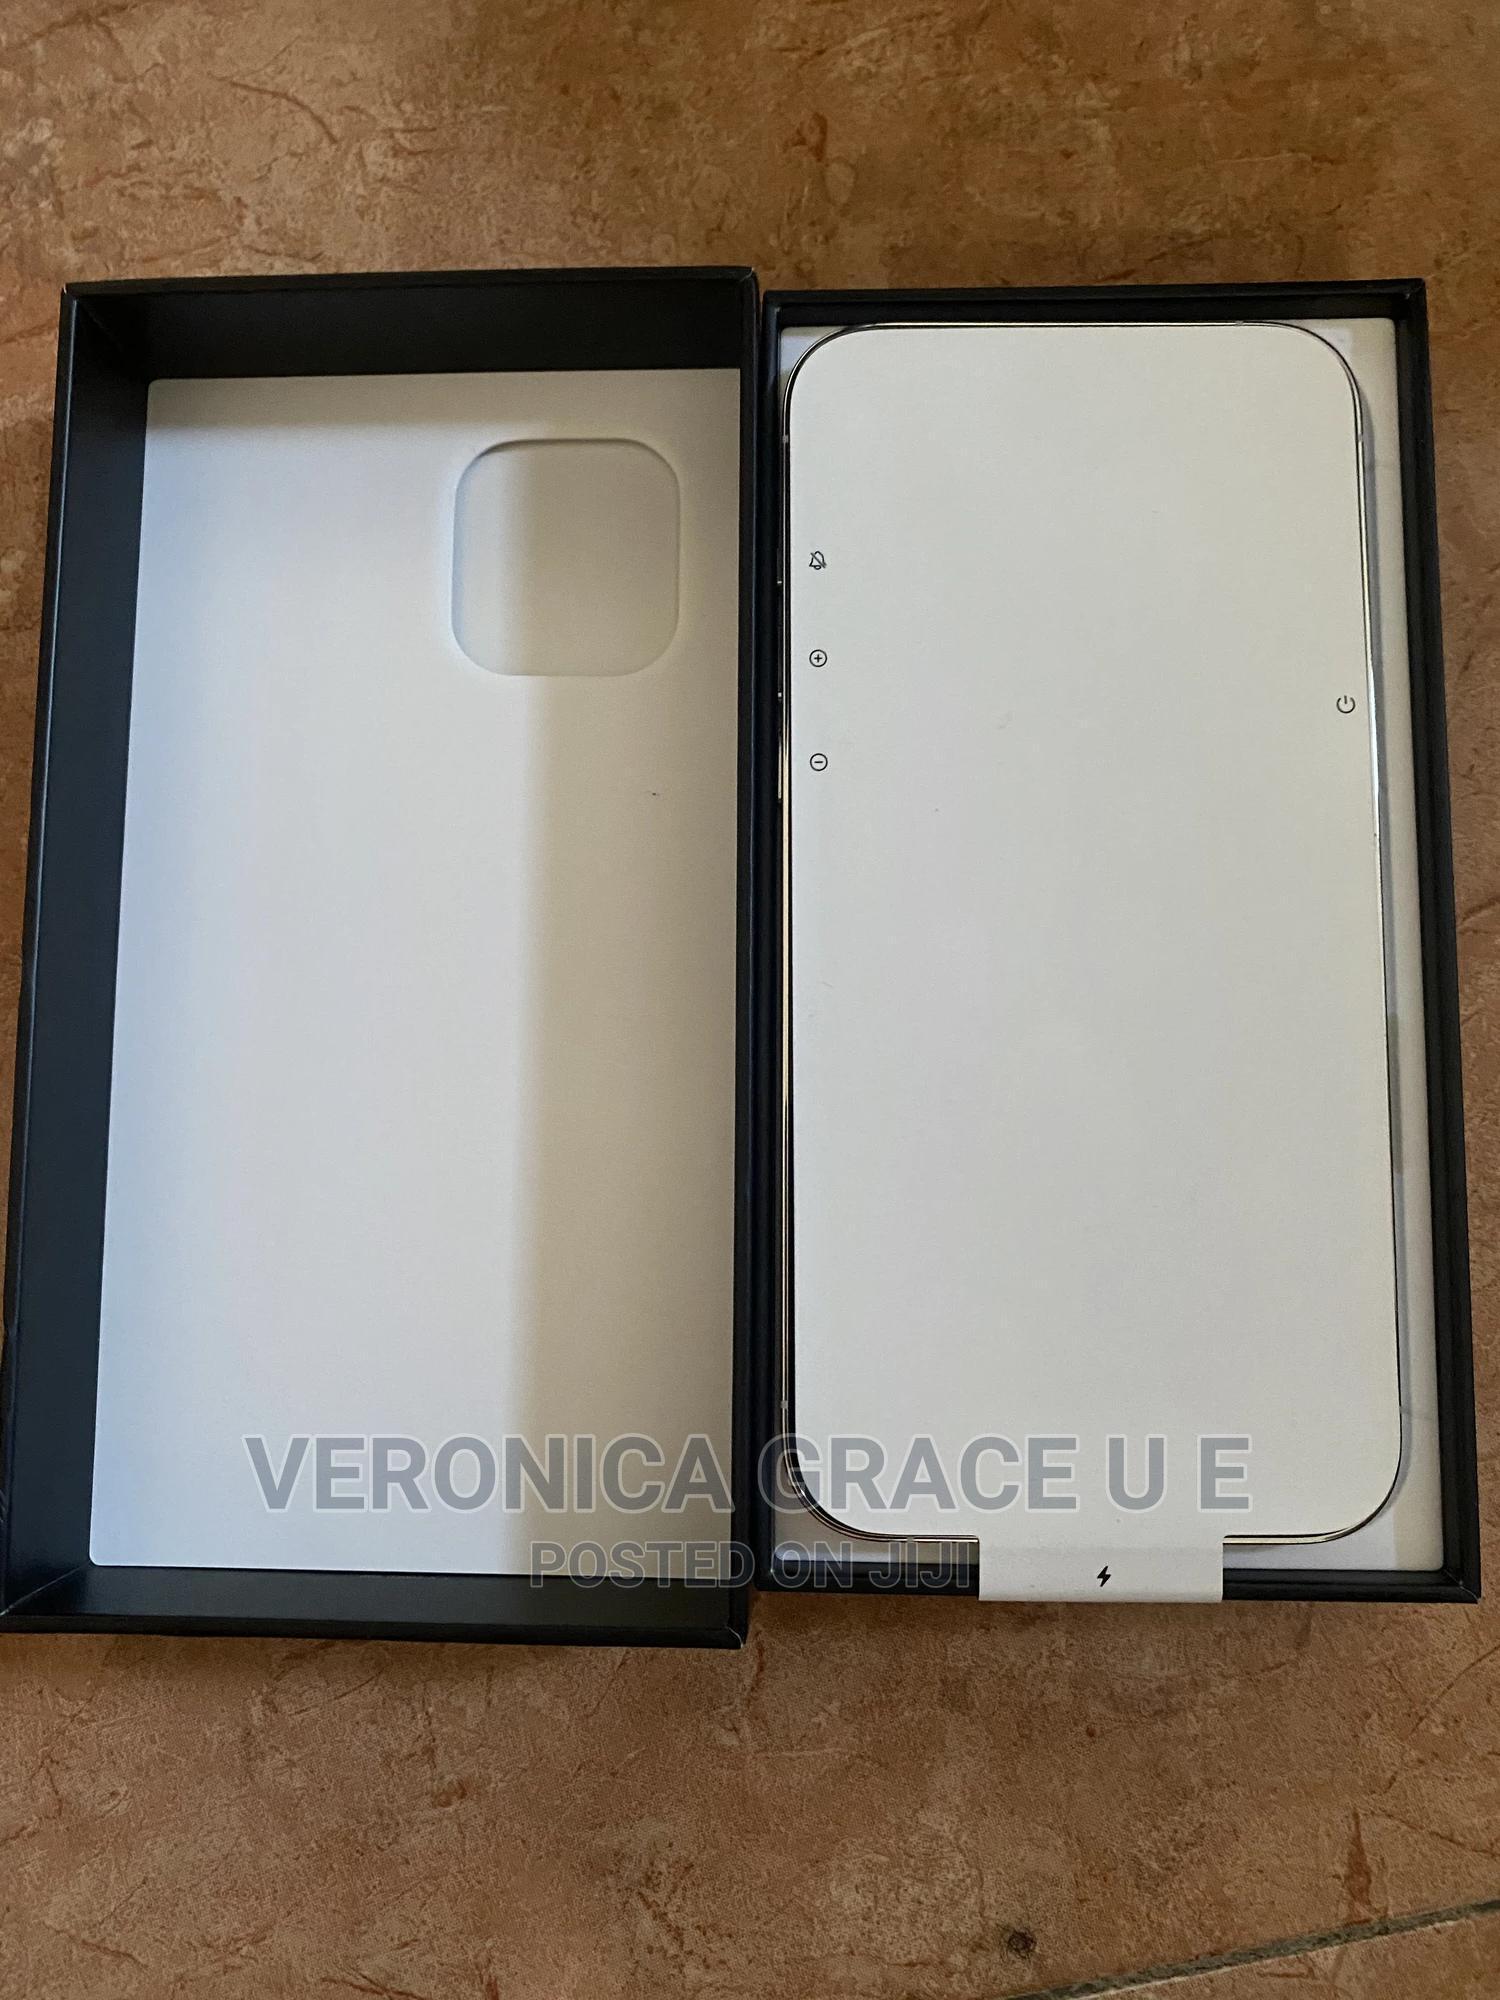 New Apple iPhone 12 Pro Max 128GB White | Mobile Phones for sale in Lekki, Lagos State, Nigeria